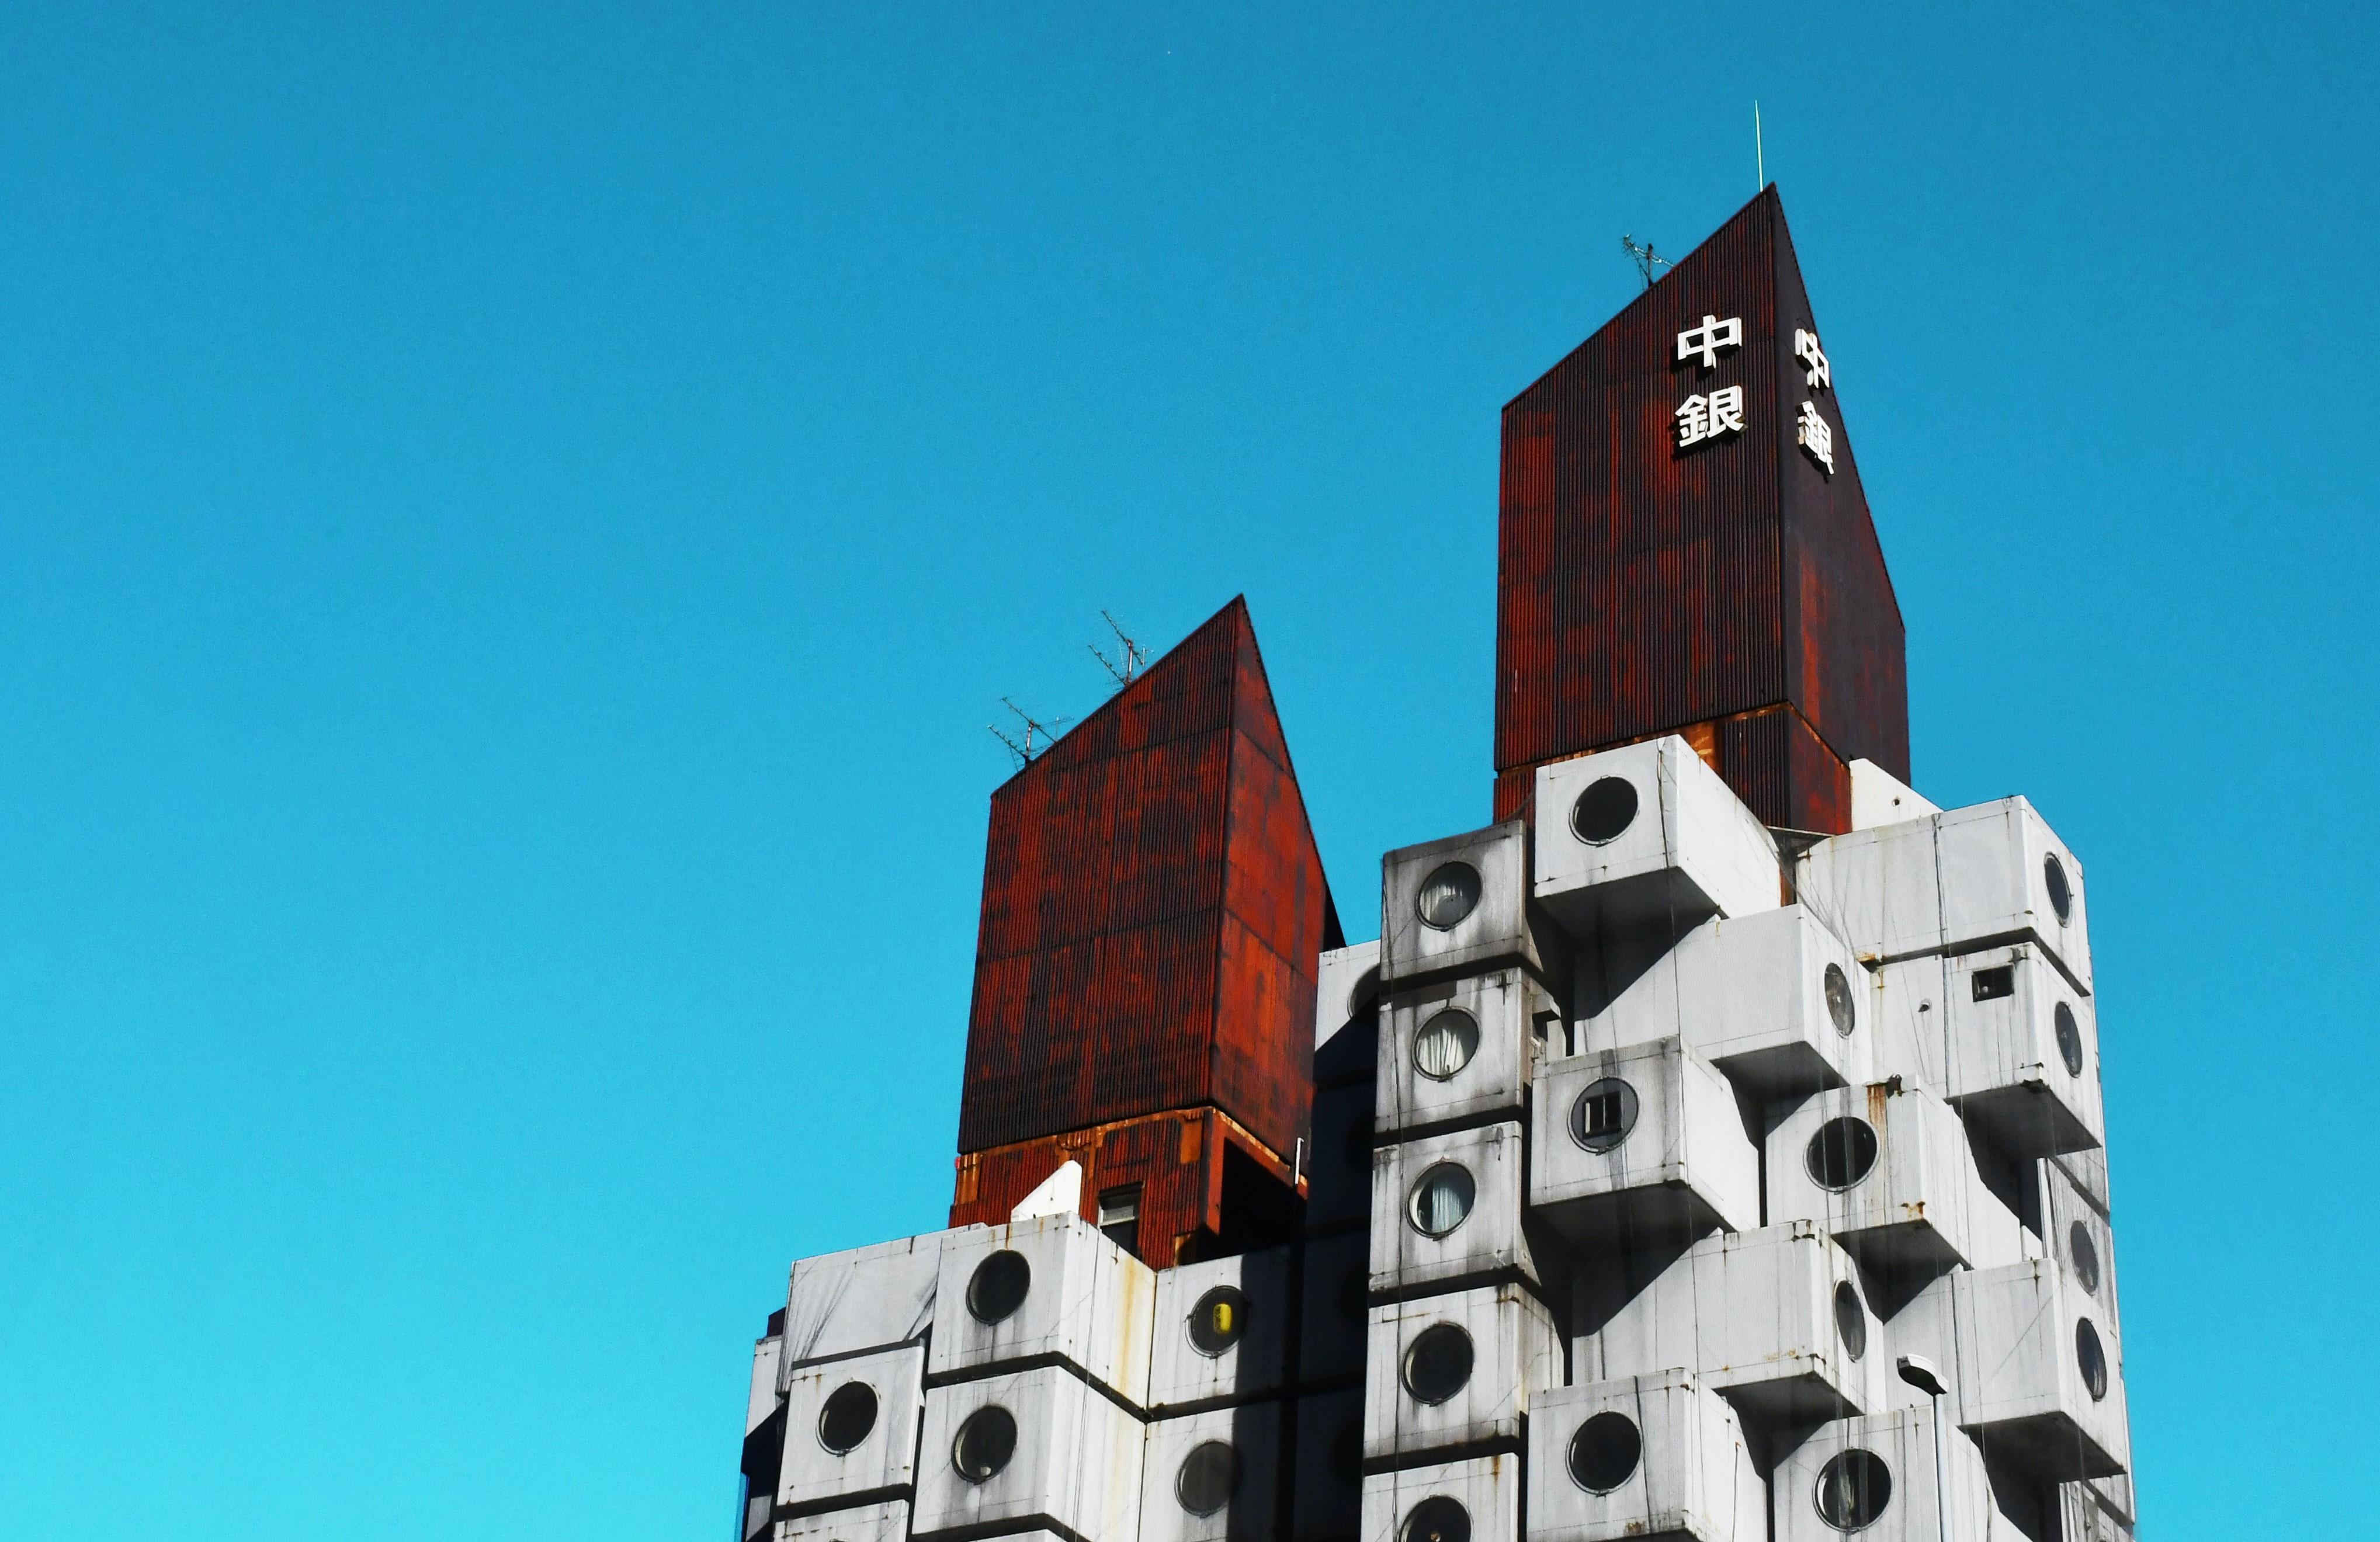 Spitzen des Nakagin Towers